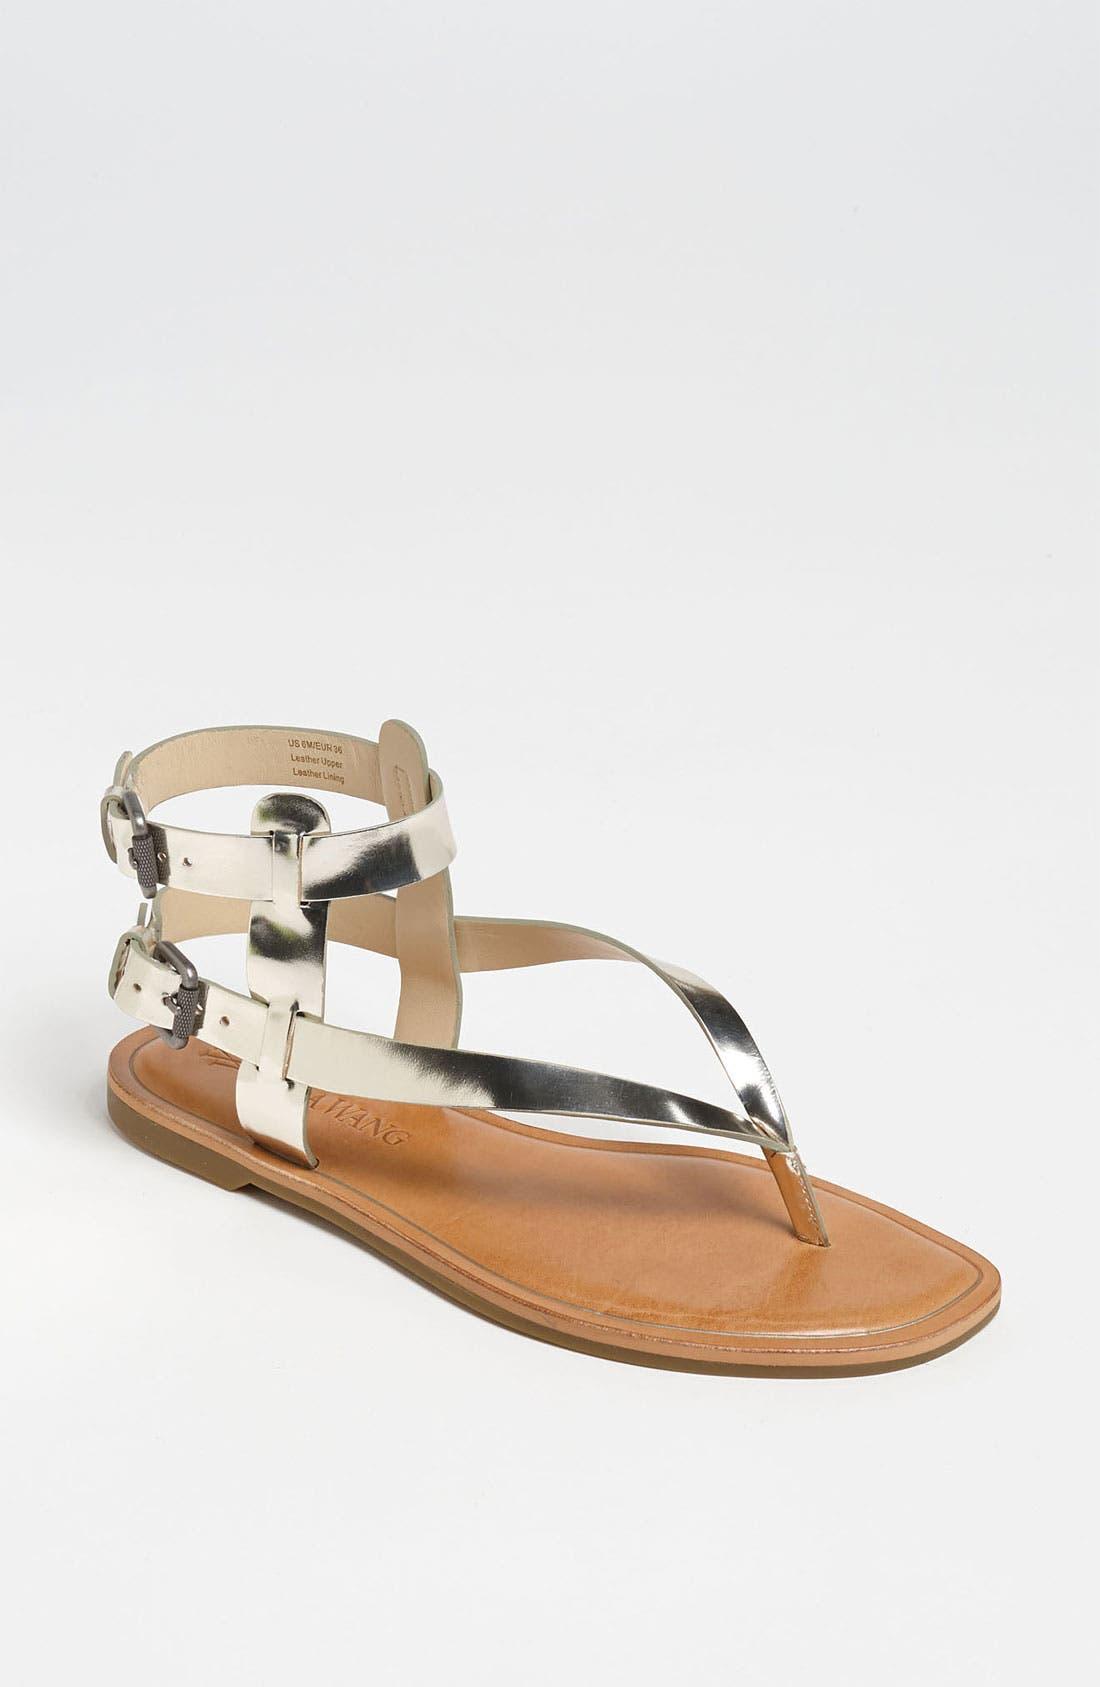 Main Image - Vera Wang Footwear 'Alena' Sandal (Online Only)